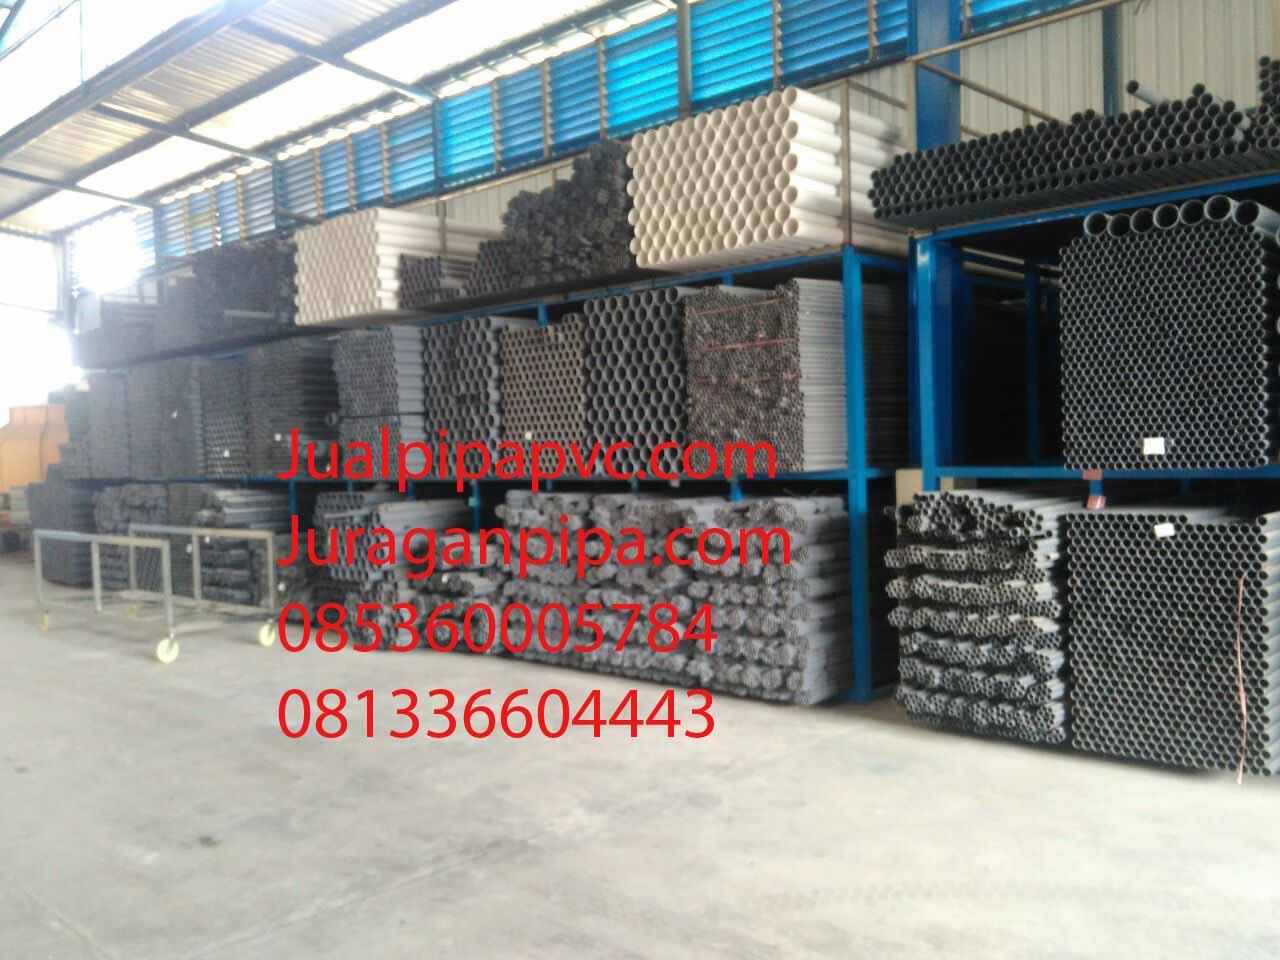 Distributor Resmi Pabrik Pipa PVC